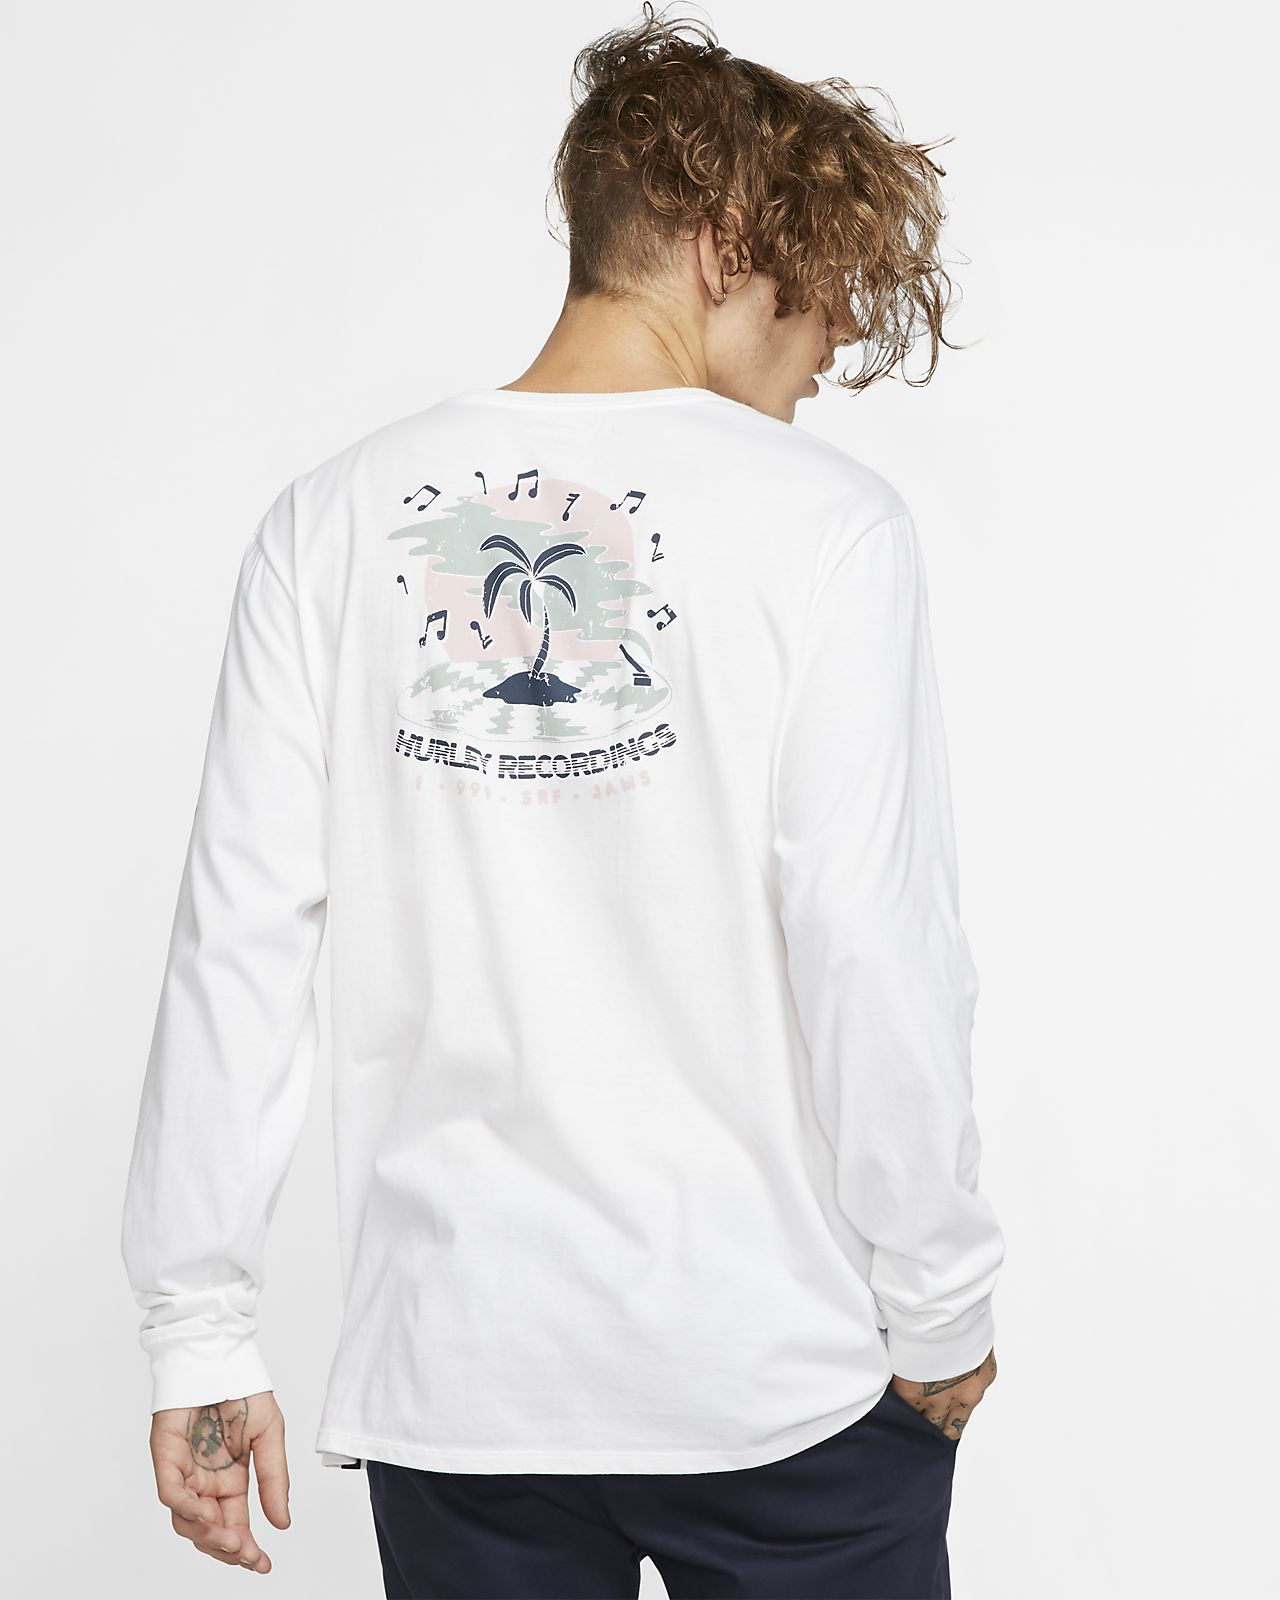 Hurley Premium Record Palms Men's Long-Sleeve T-Shirt